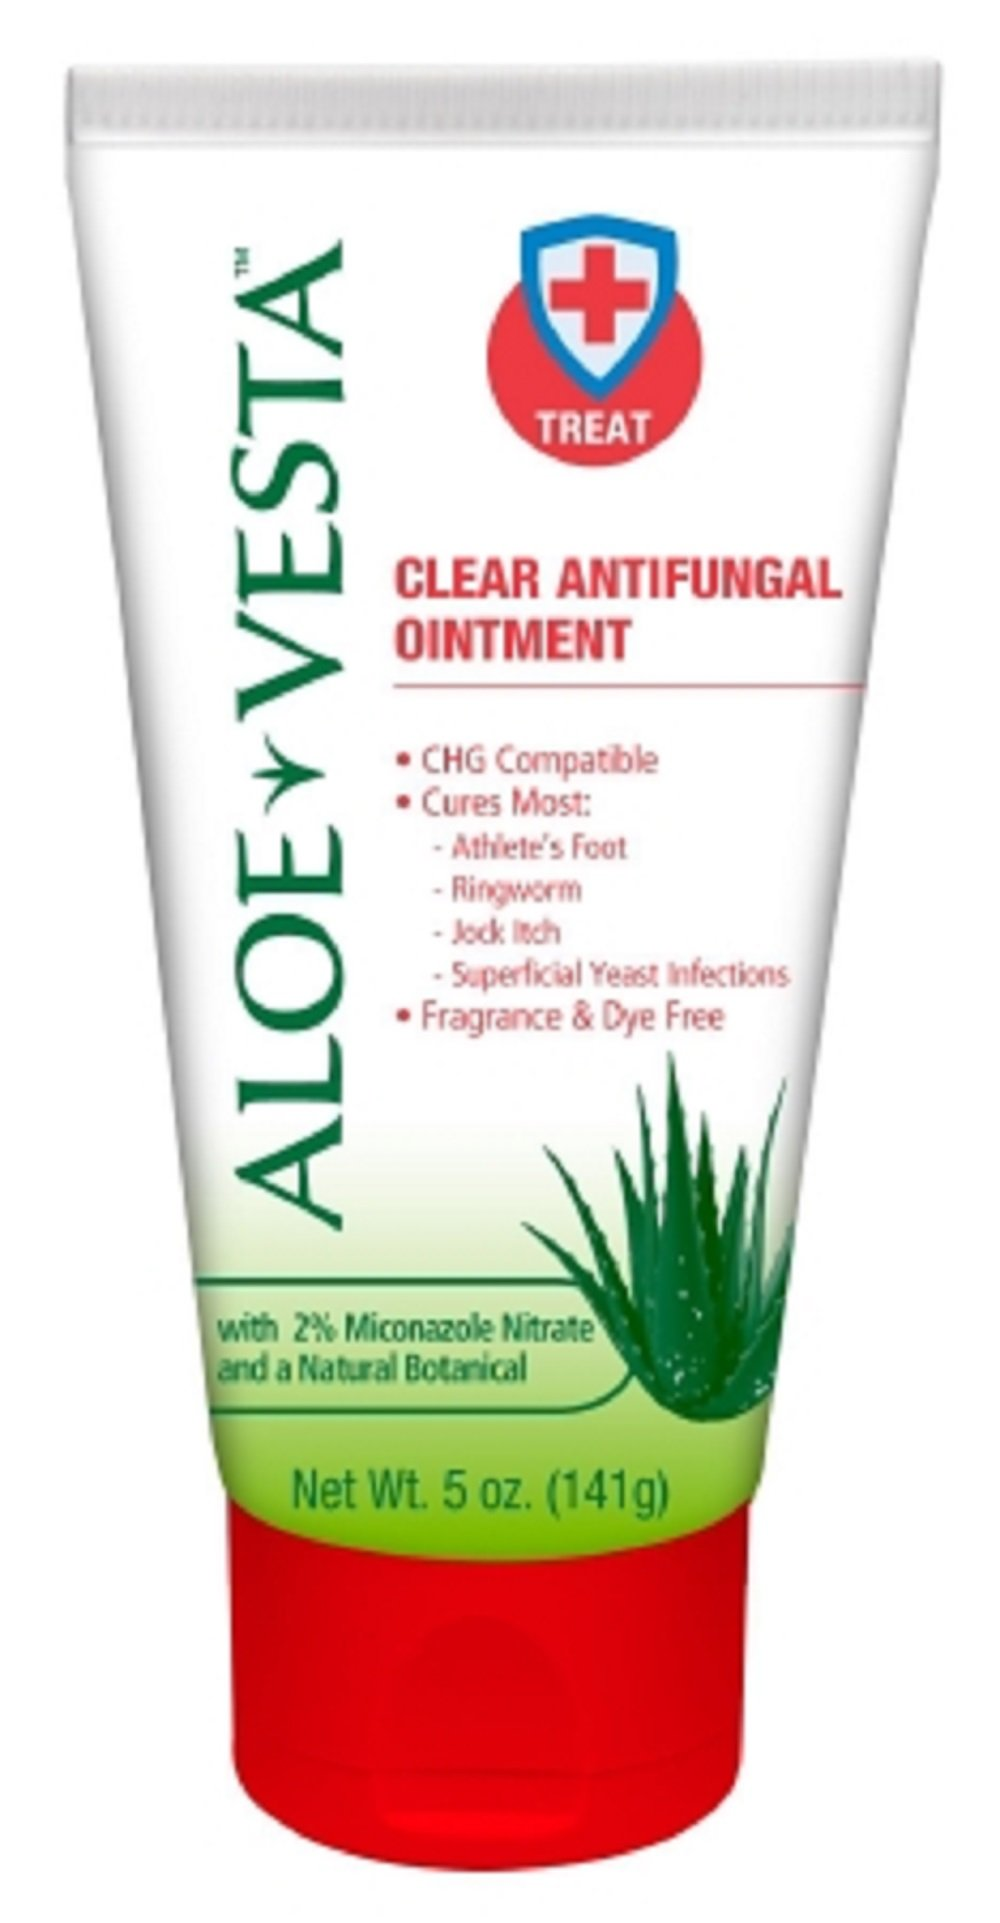 Aloe Vesta - Antifungal - 2% Strength Ointment - 12/Case - 5 oz. Tube - McK